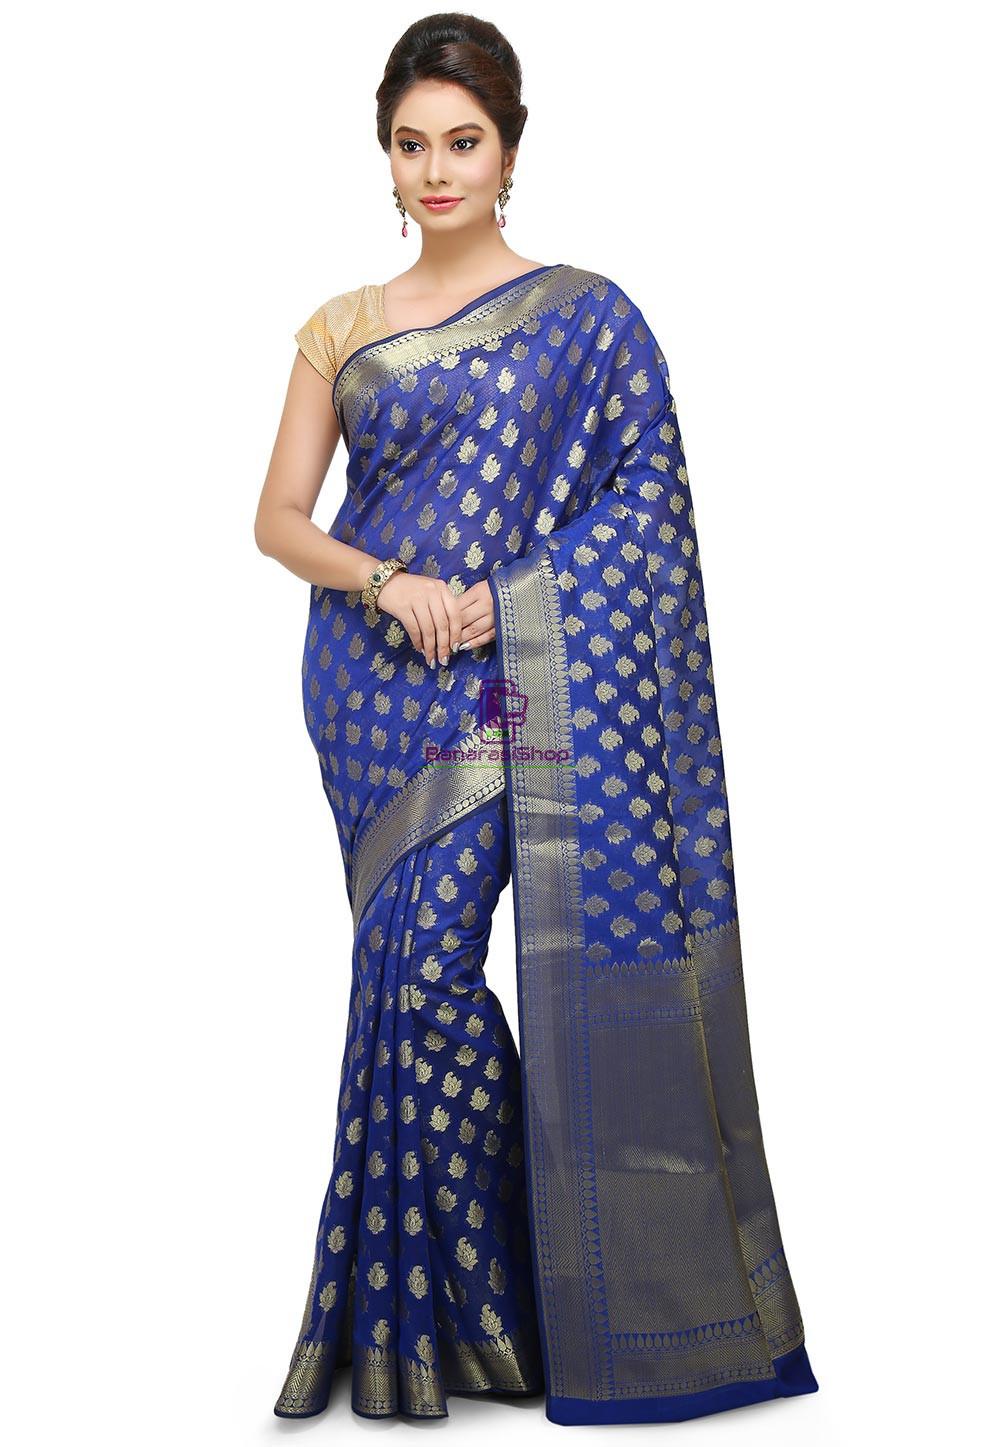 Banarasi Saree in Royal Blue 1